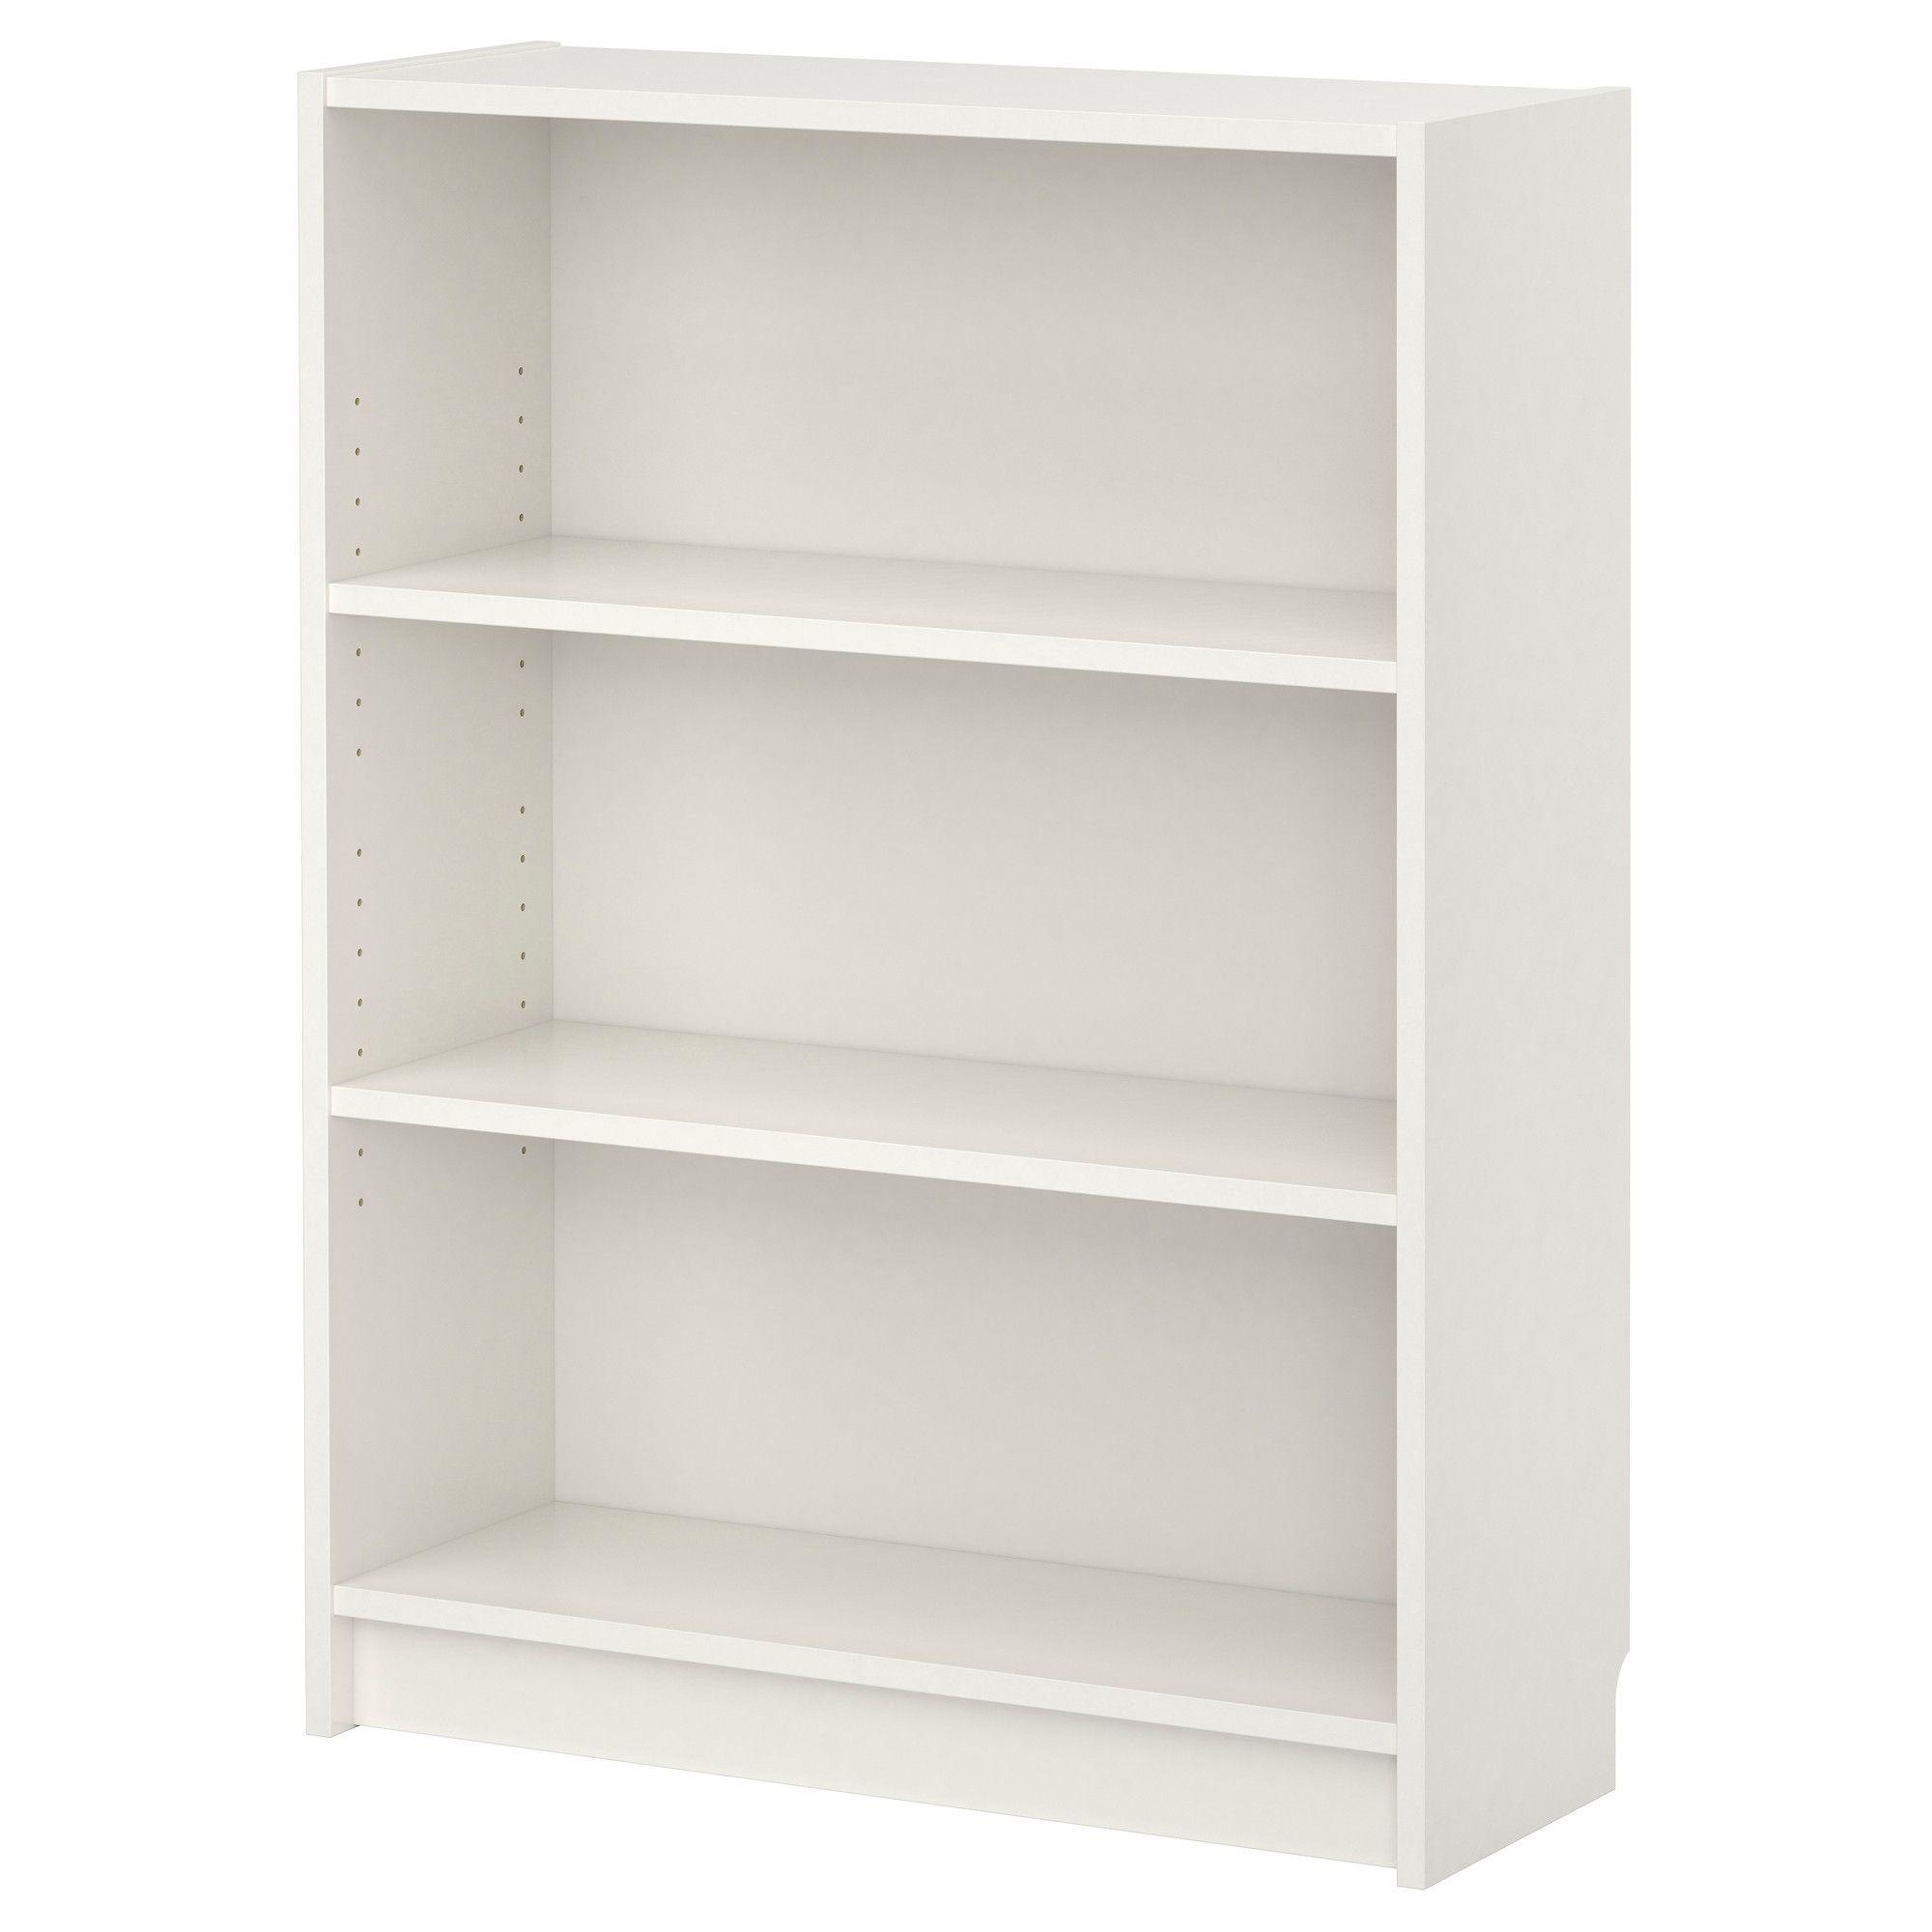 BILLY Estante - branco, 80x28x106 cm - IKEA